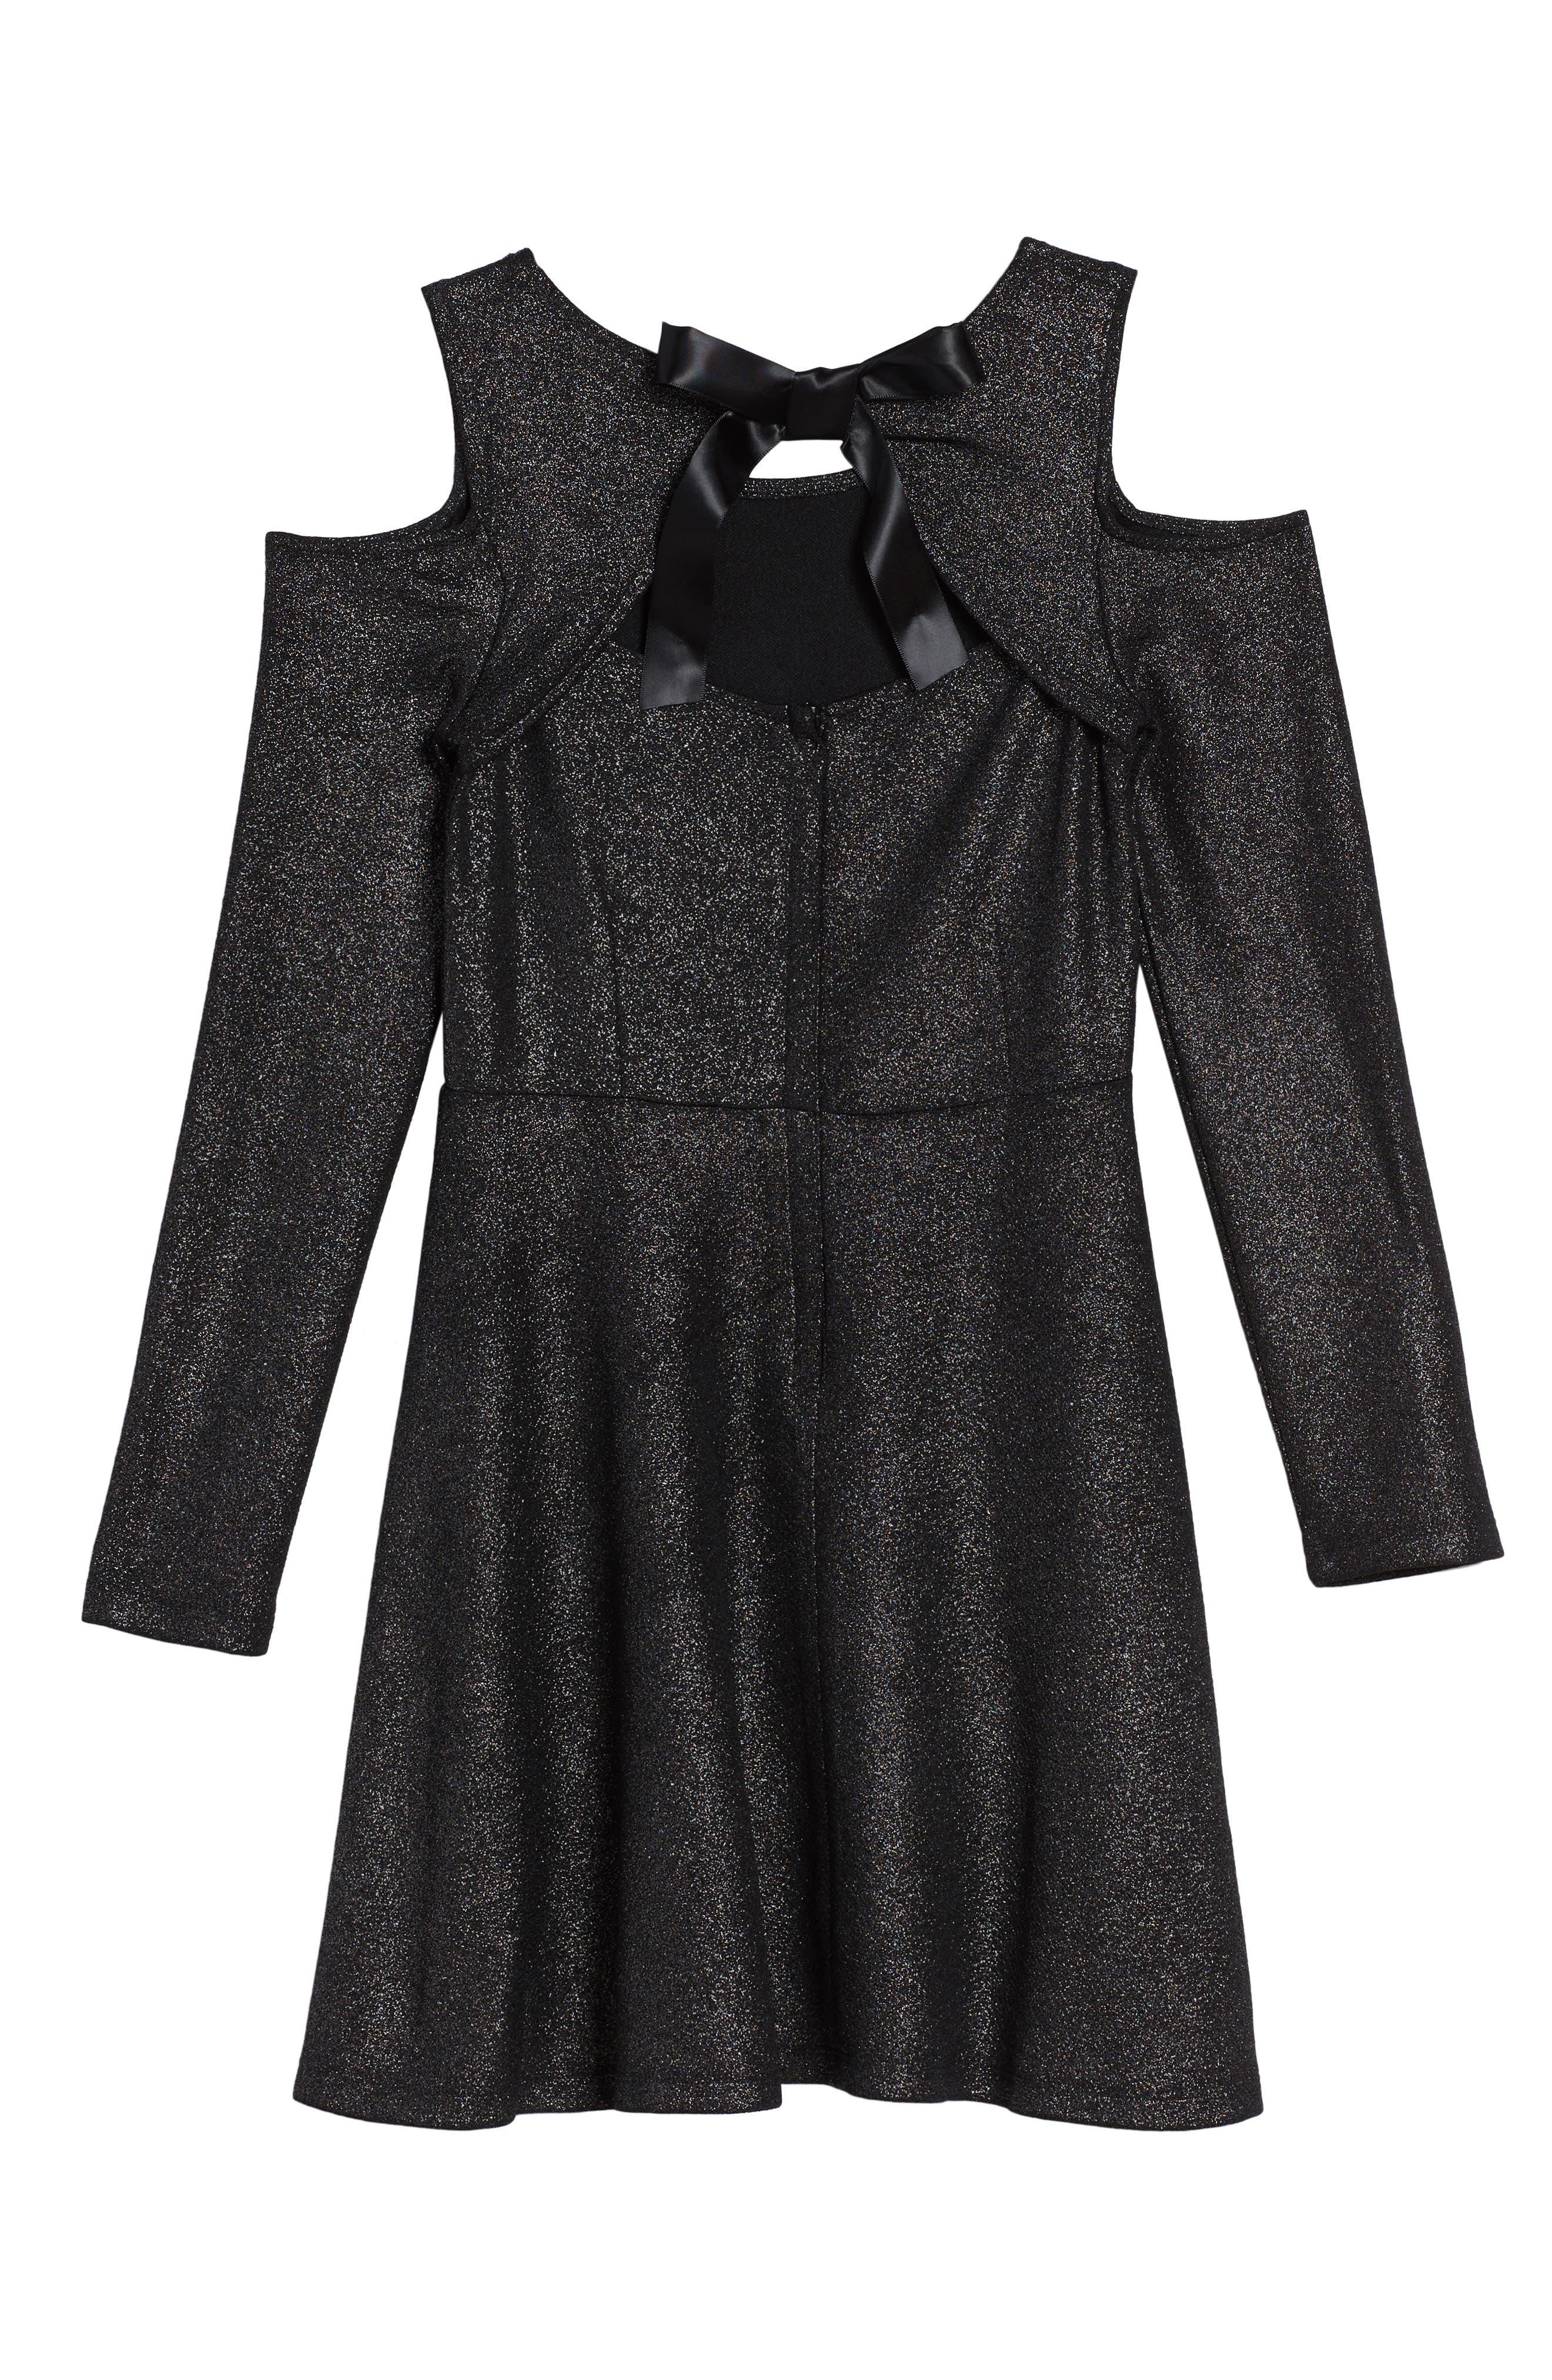 Sparkle Knit Cold Shoulder Dress,                             Alternate thumbnail 2, color,                             Black